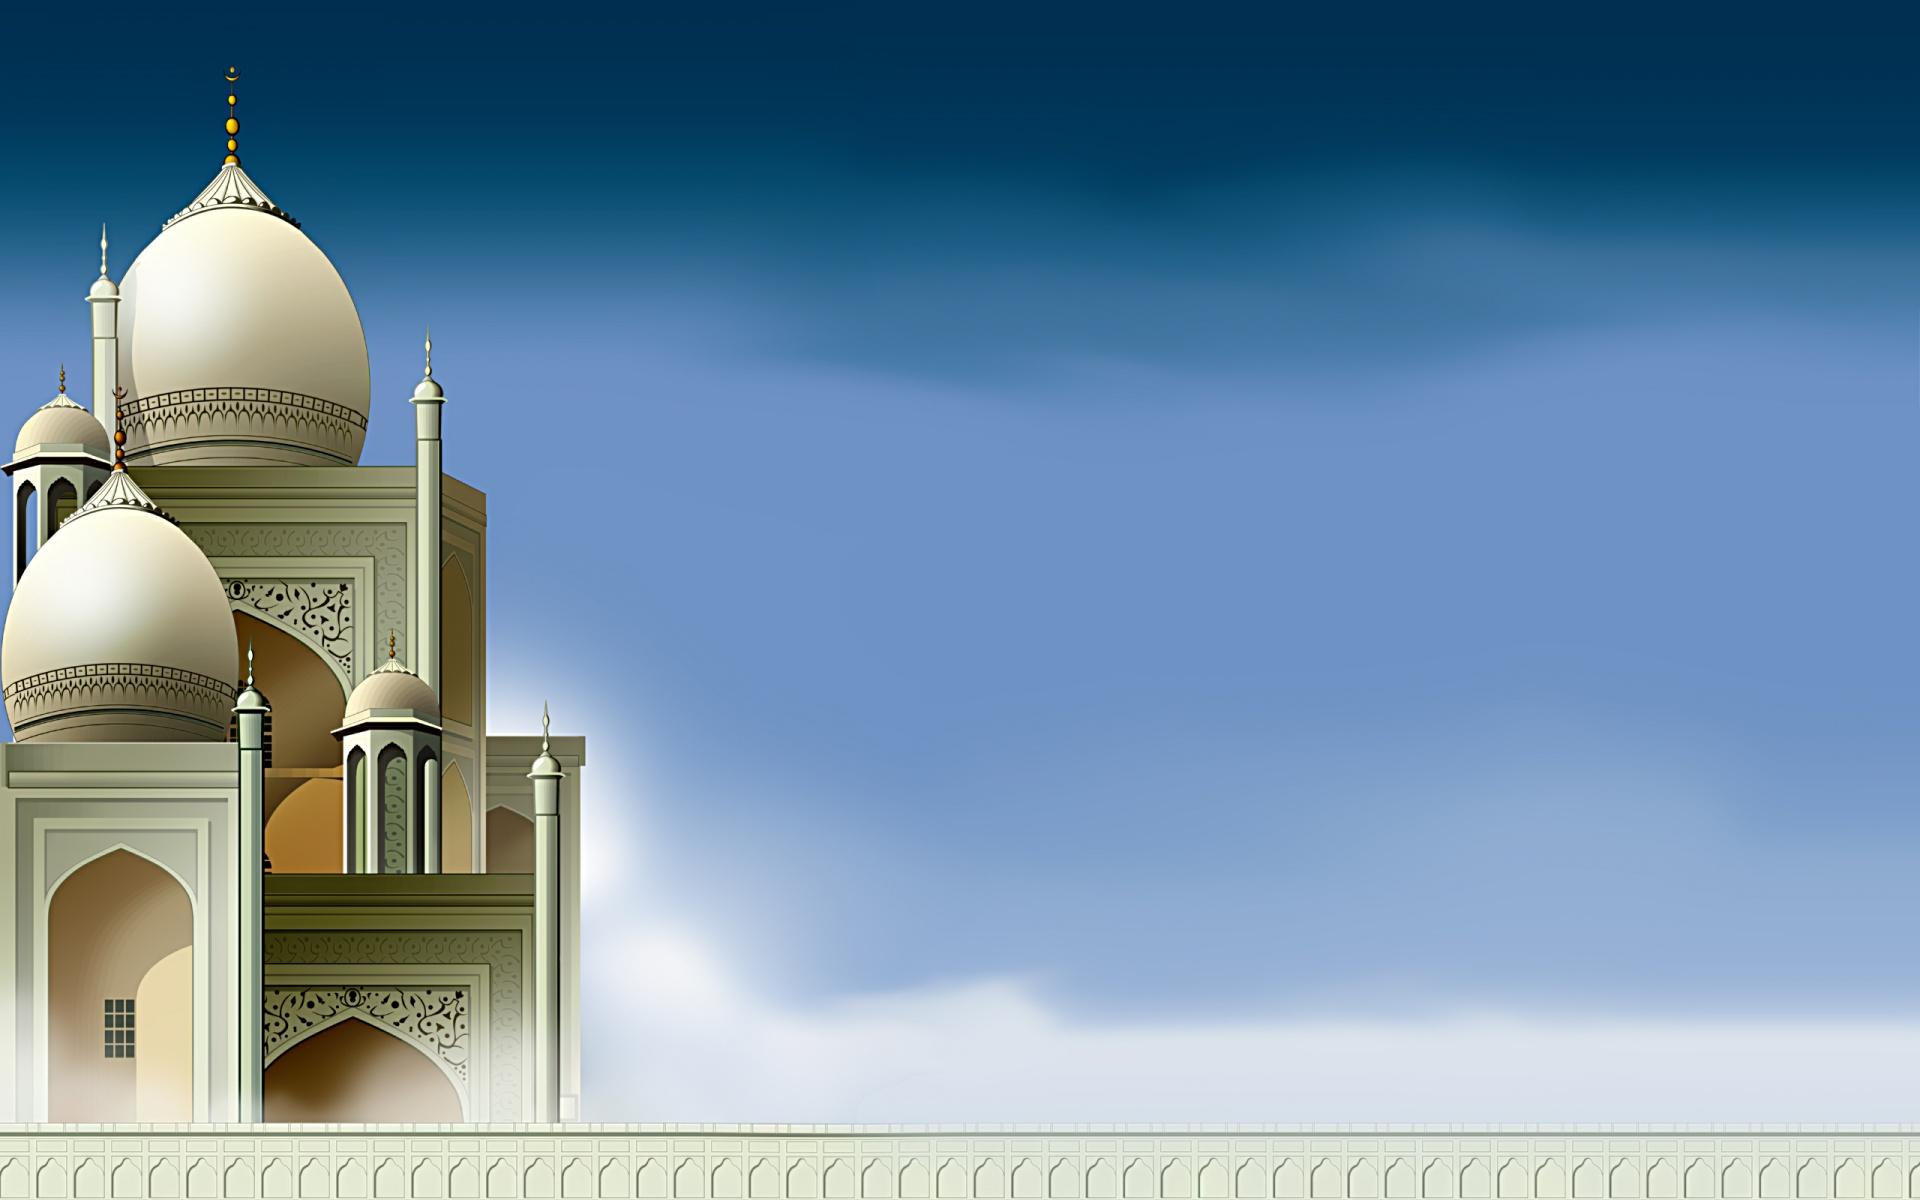 Hd wallpaper masjid - Wallpapers Of Background Wallpapersafari